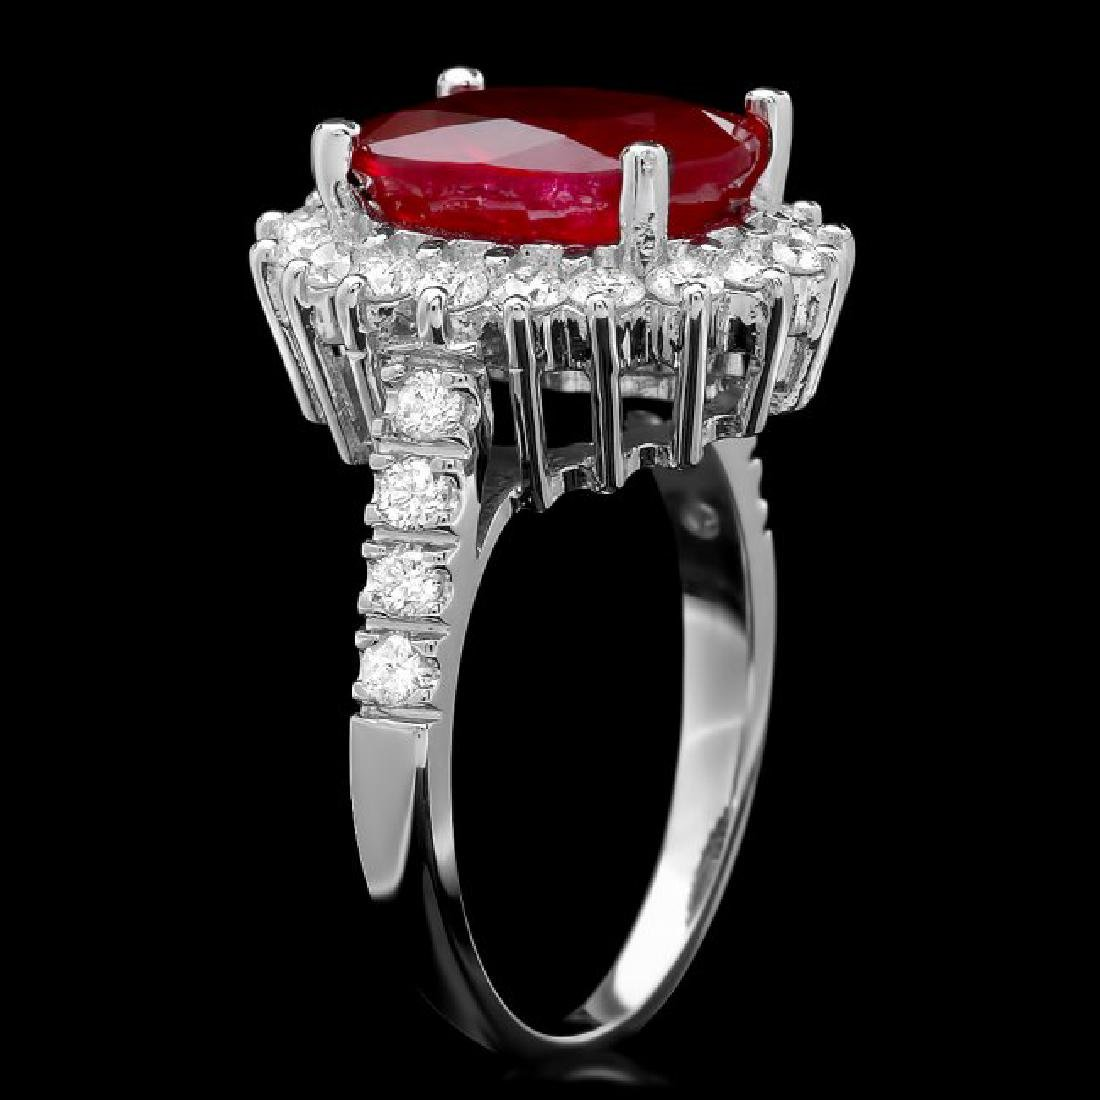 14k White Gold 4.50ct Ruby 0.90ct Diamond Ring - 2